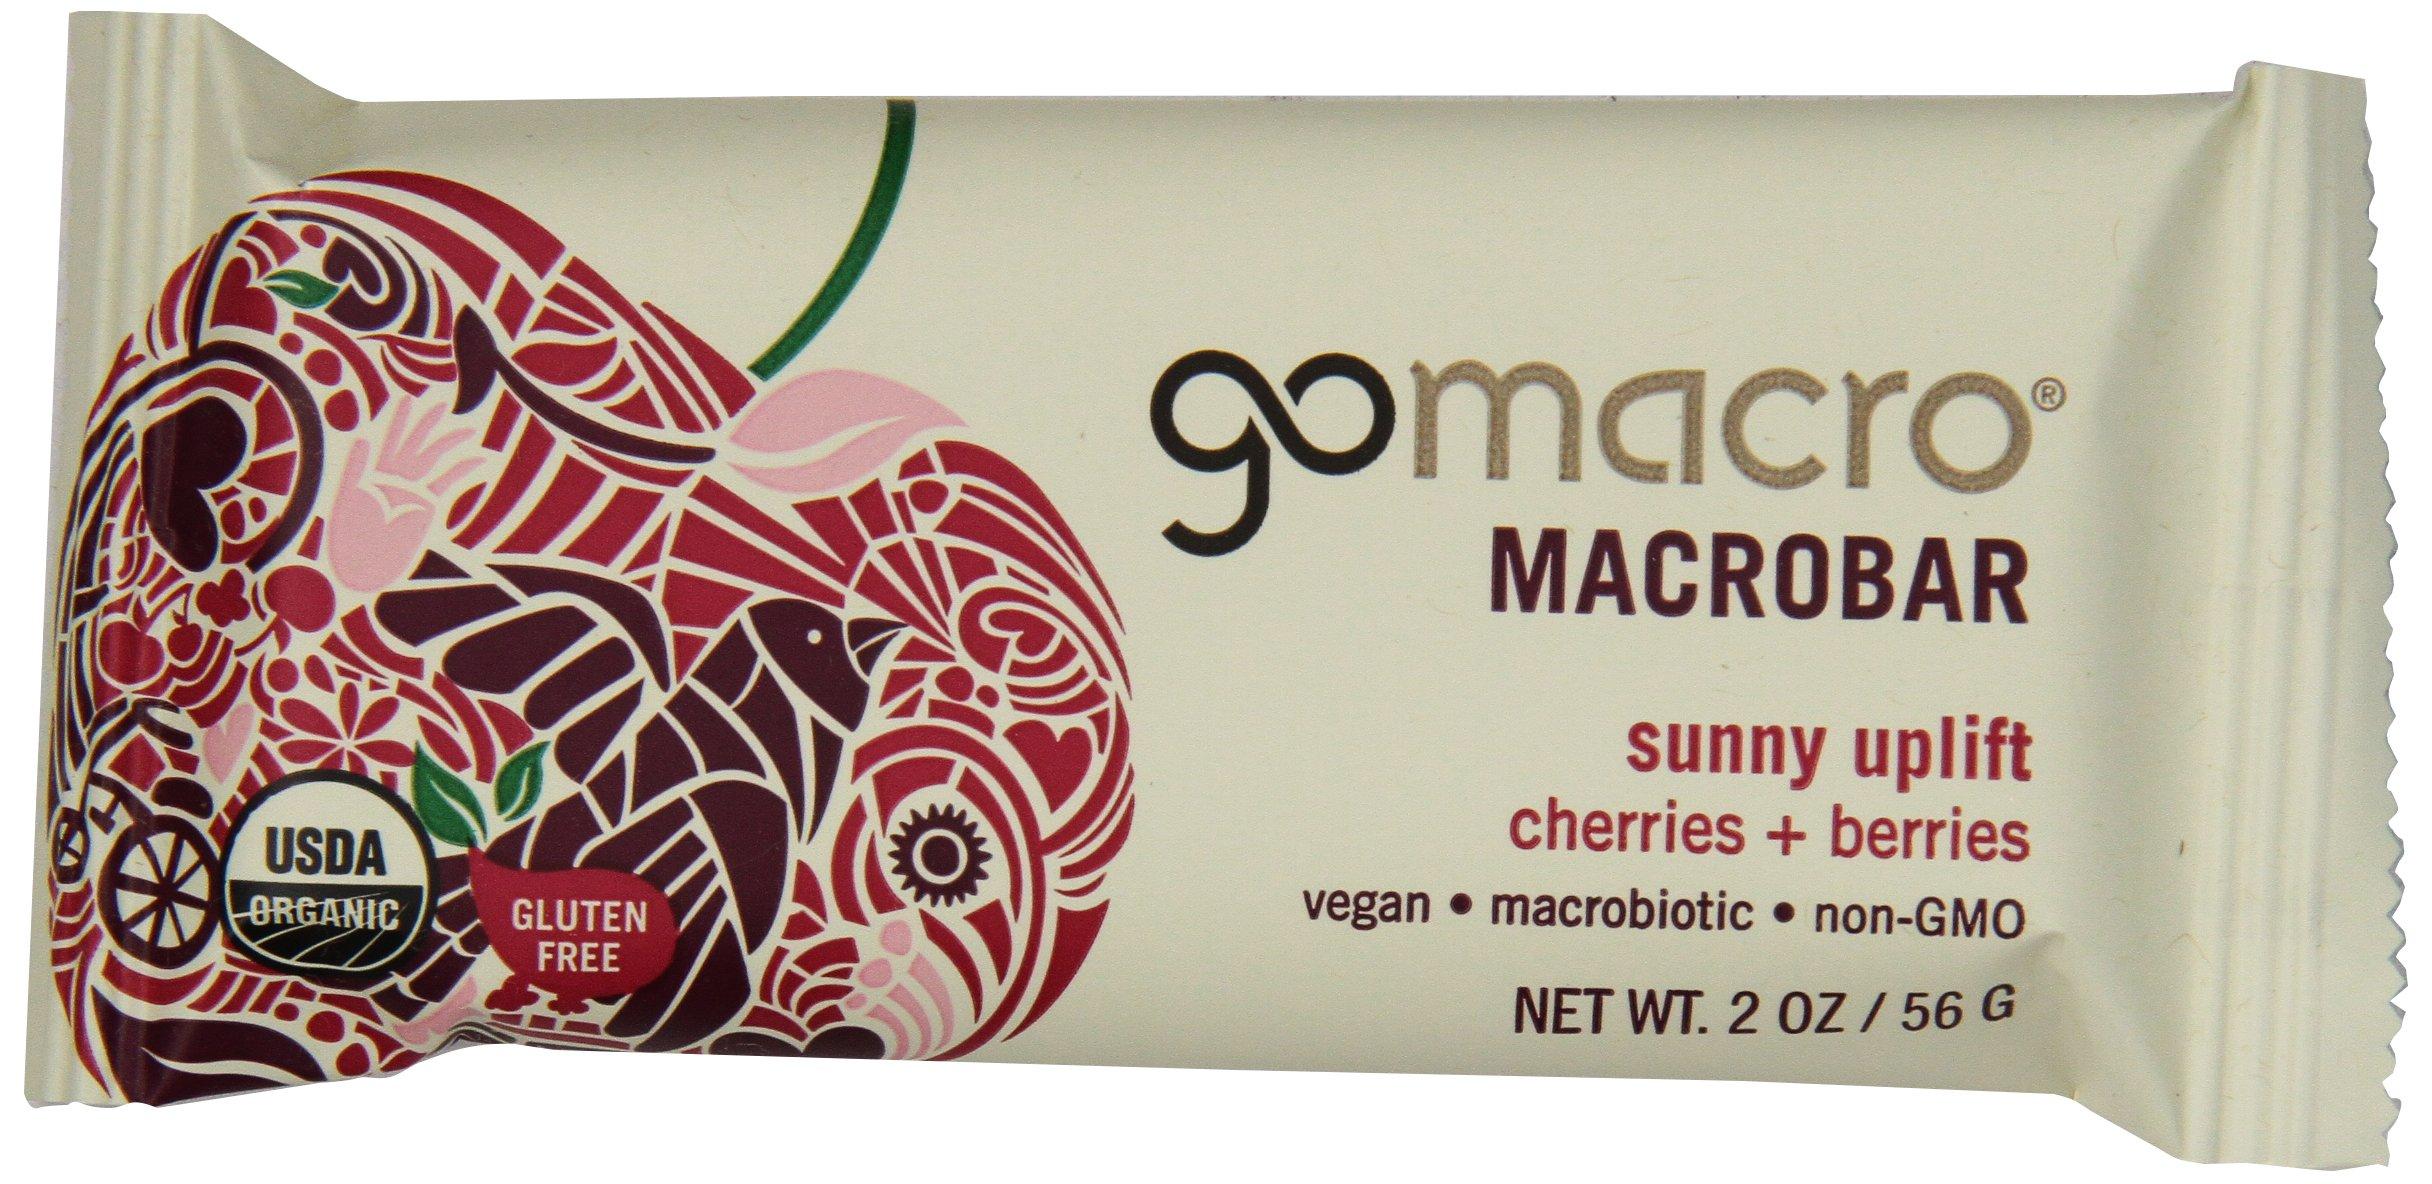 GoMacro MacroBar Organic Vegan Snack Bars, Cherries & Berries, 2 Ounce Bars (Pack of 12)